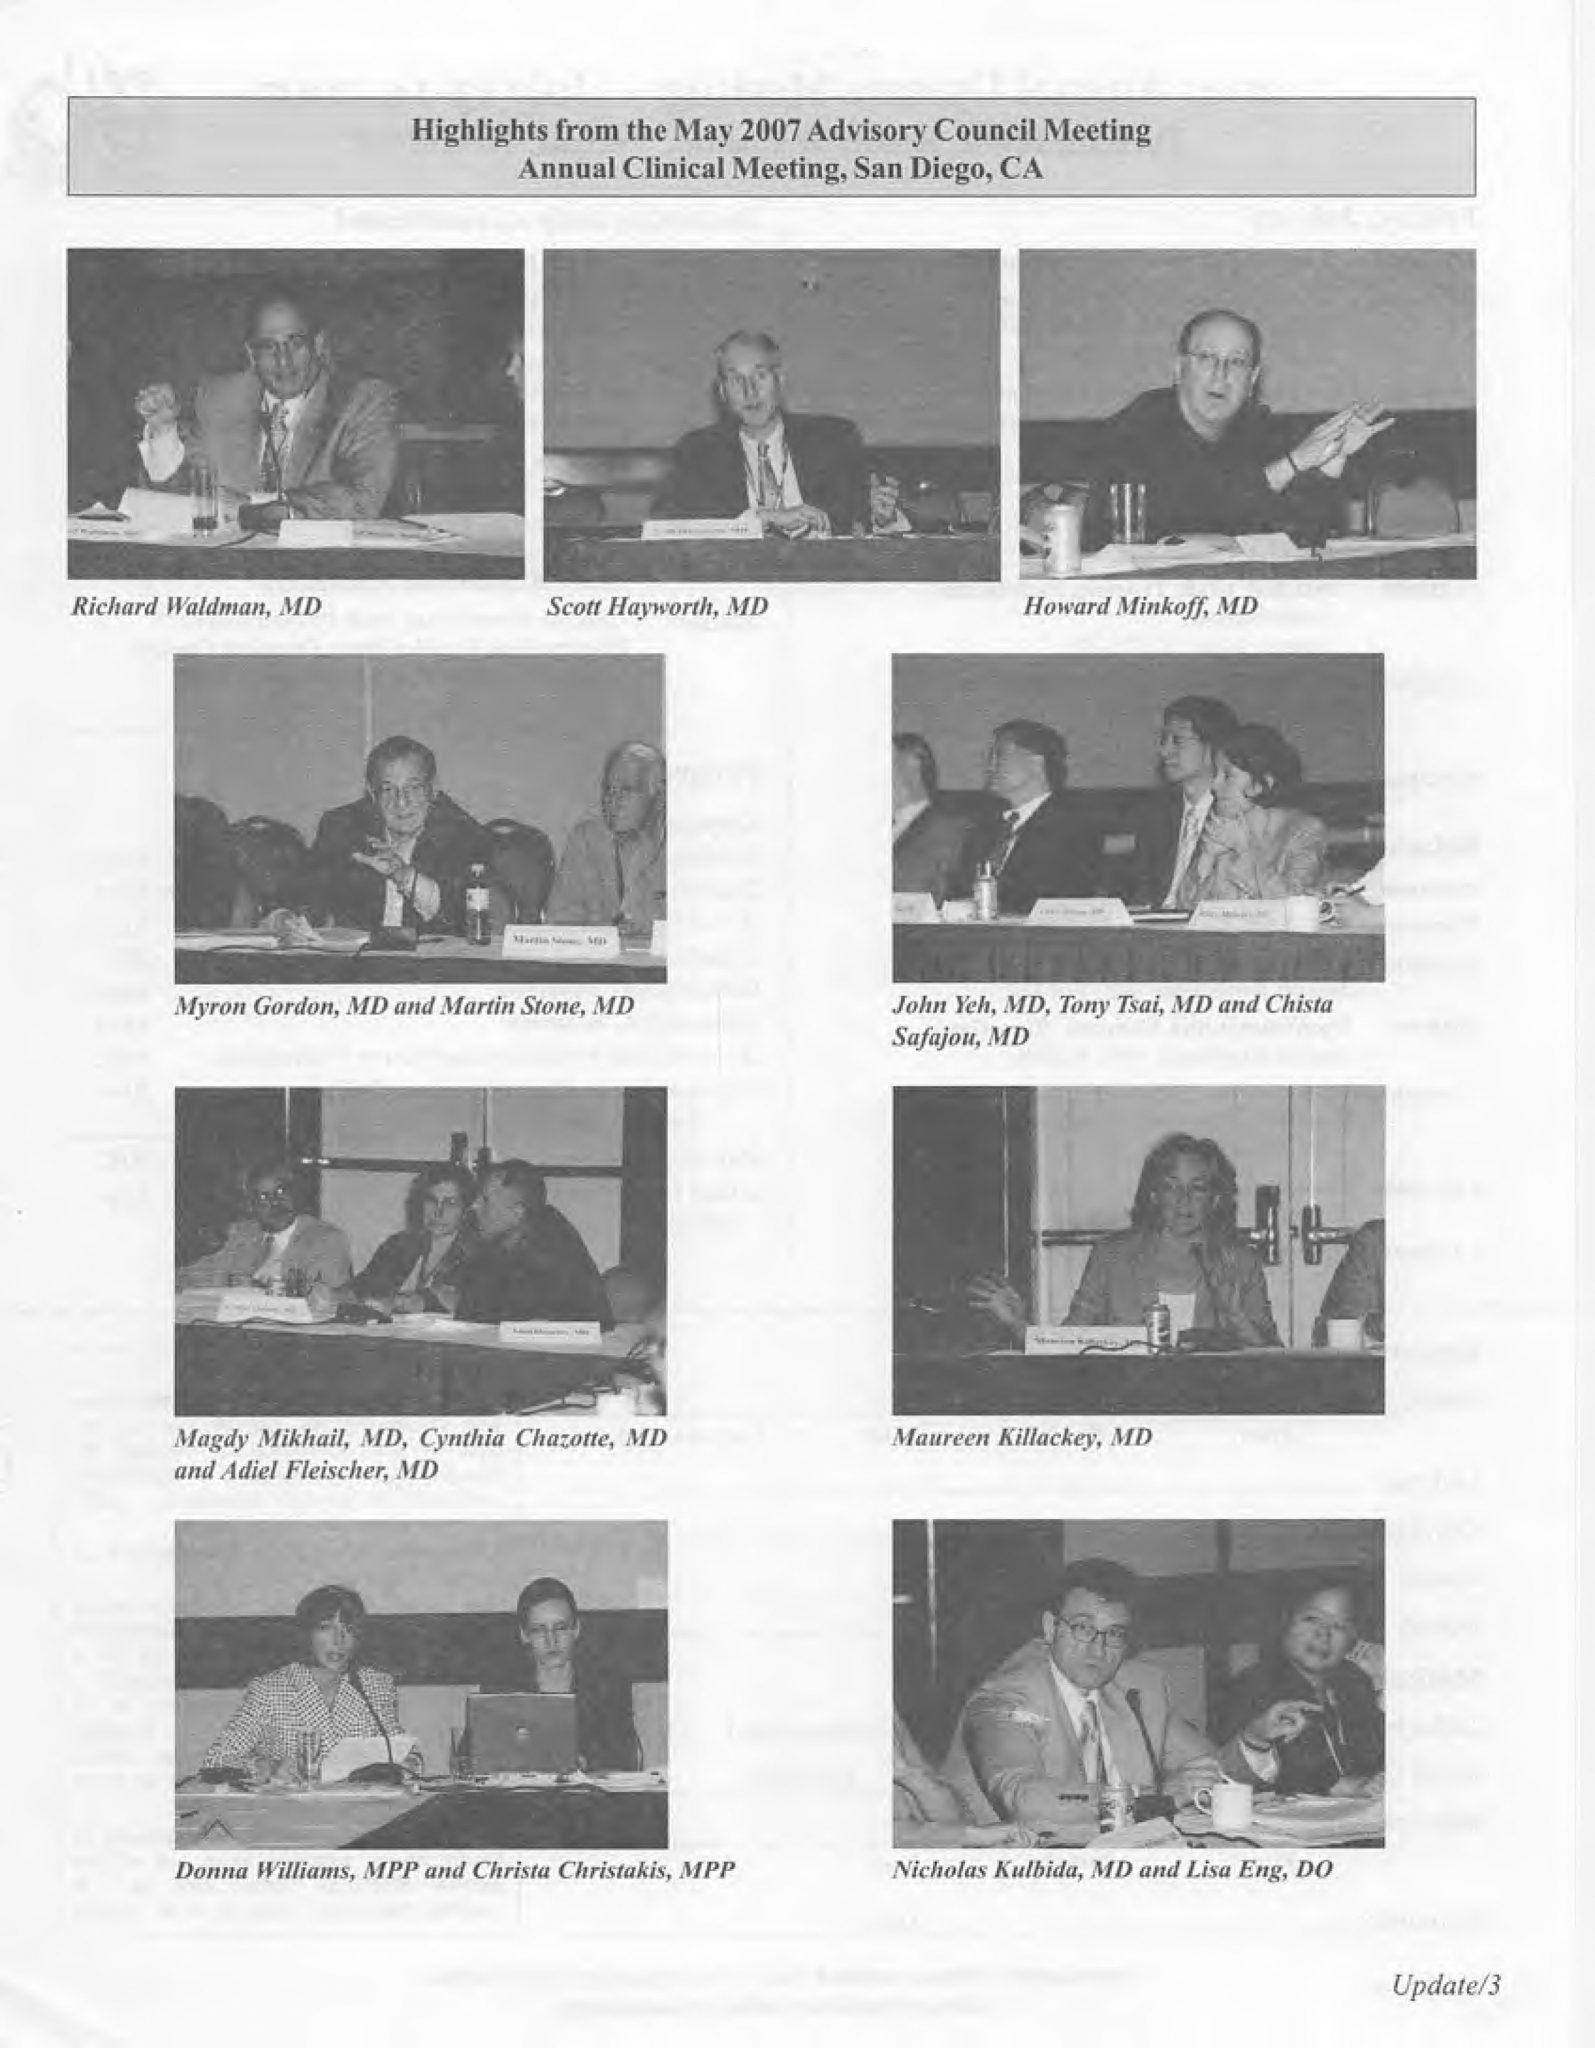 ACOG Advisory Council Meeting 2007